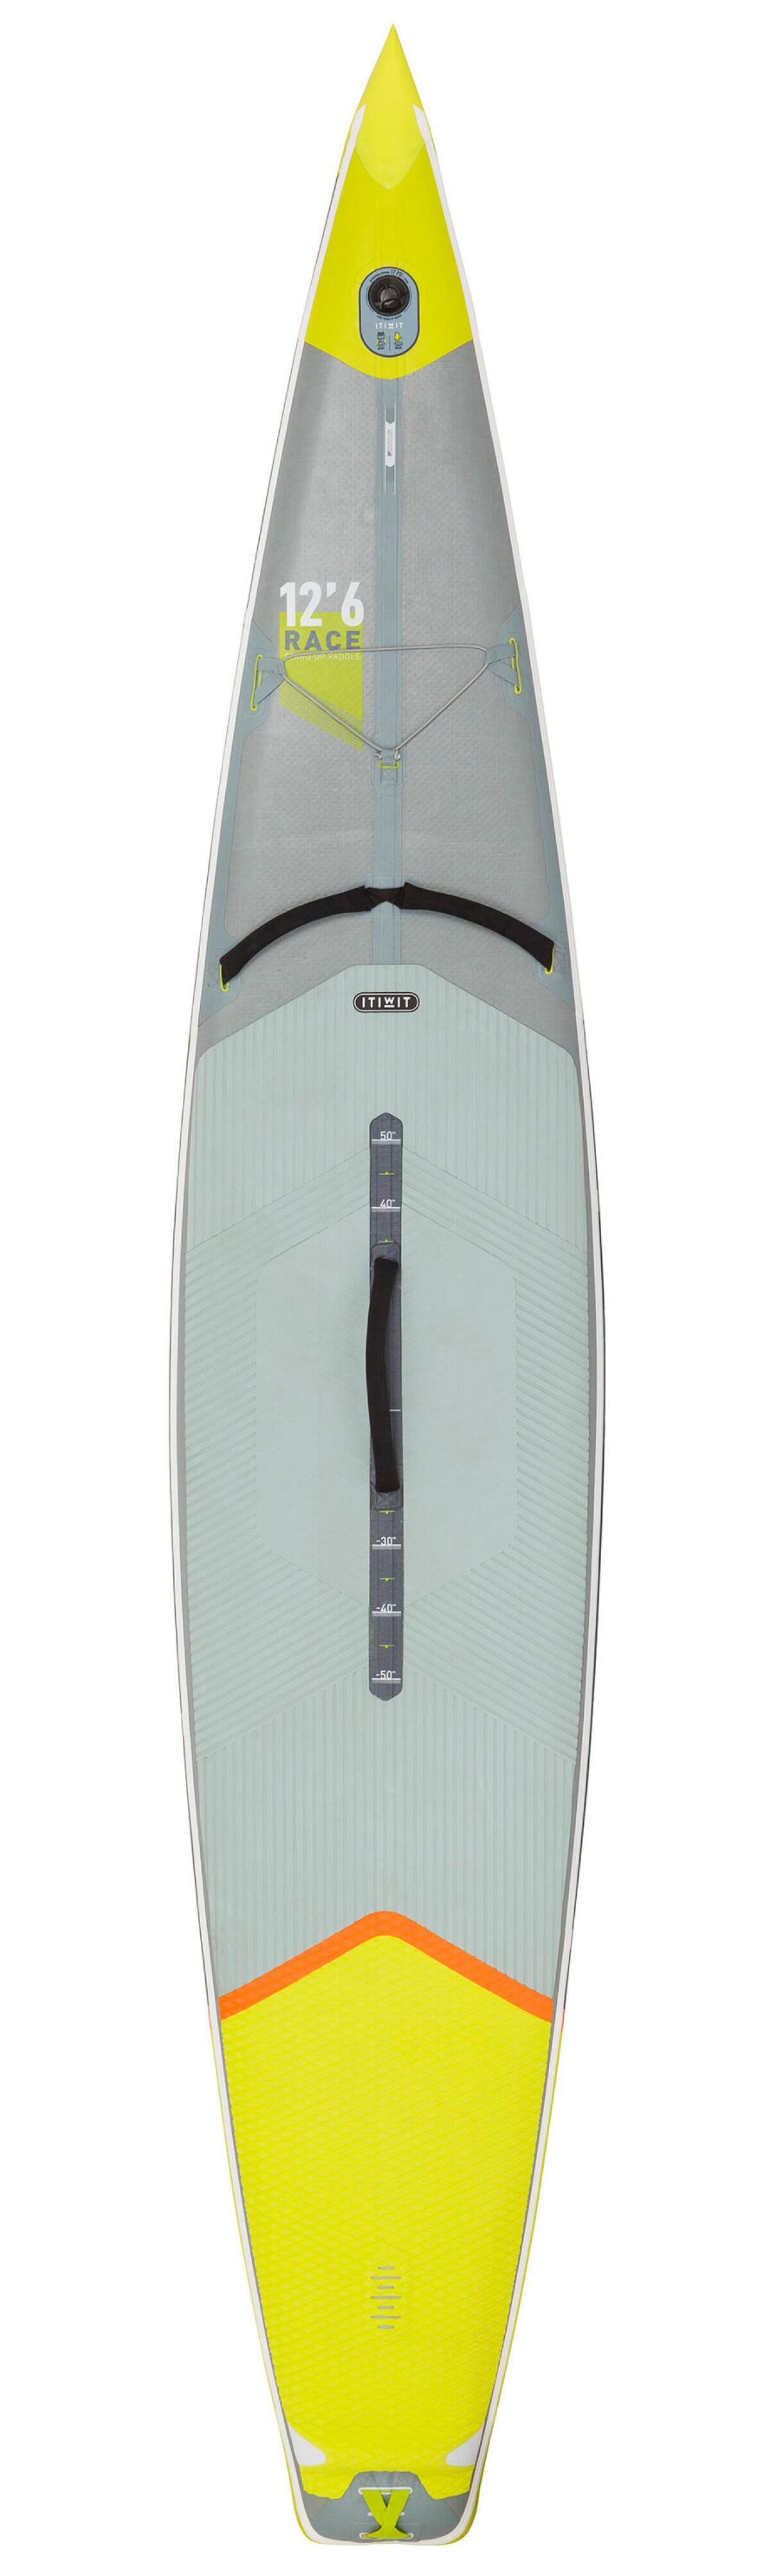 itiwit-inflatable-race-sup-126-decathlon